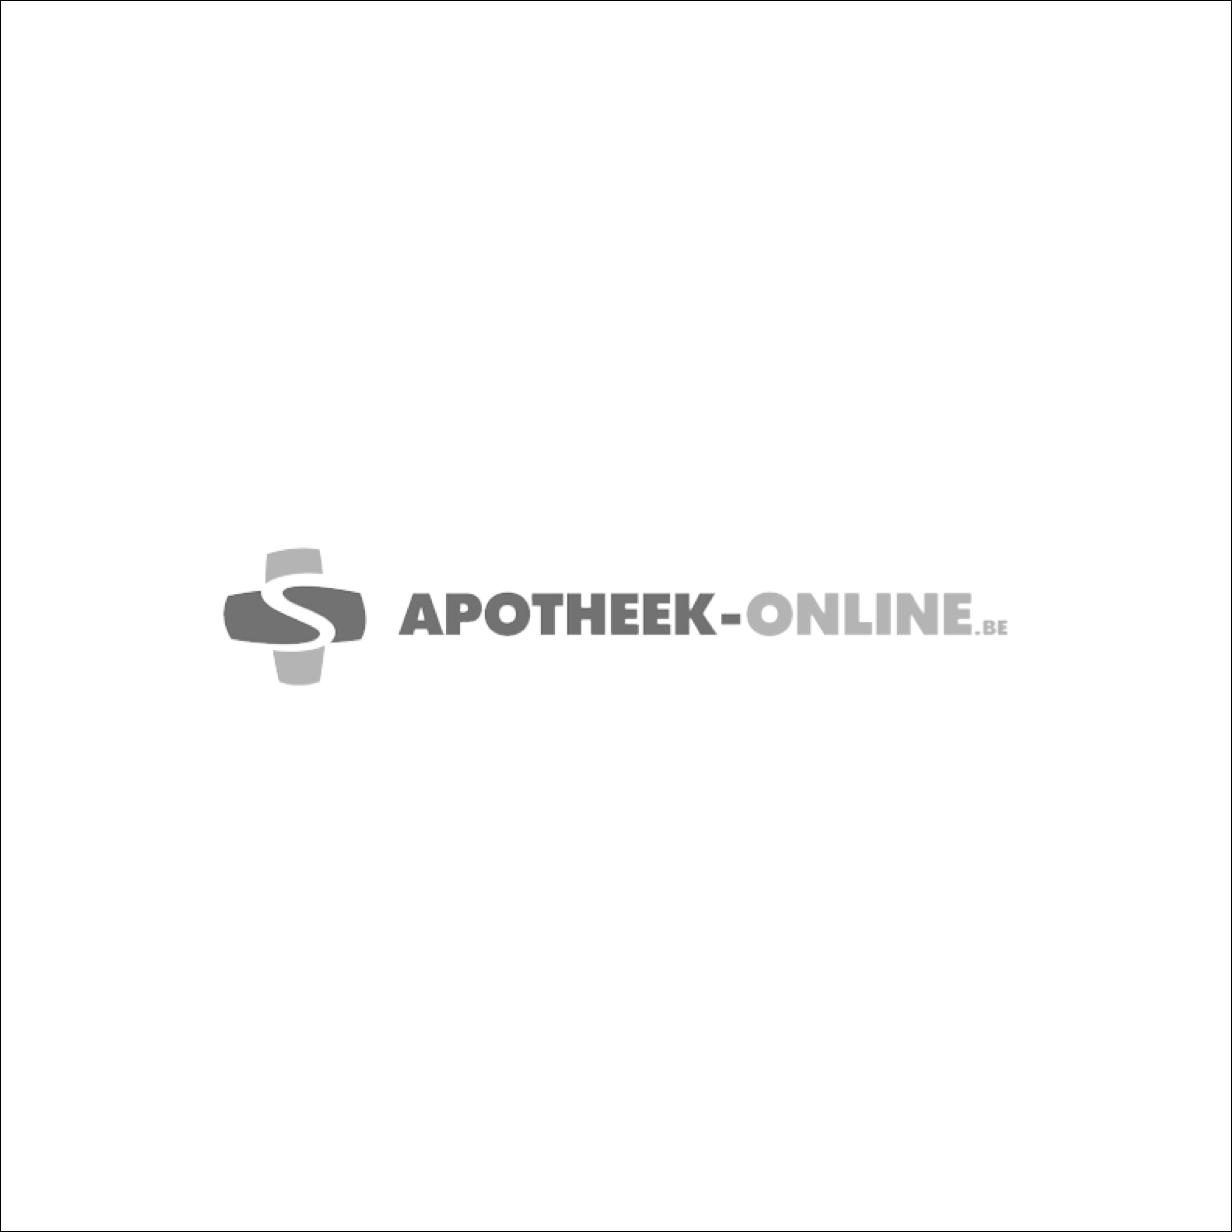 Bota Handpolsband 201 Skin M 1 Stuk